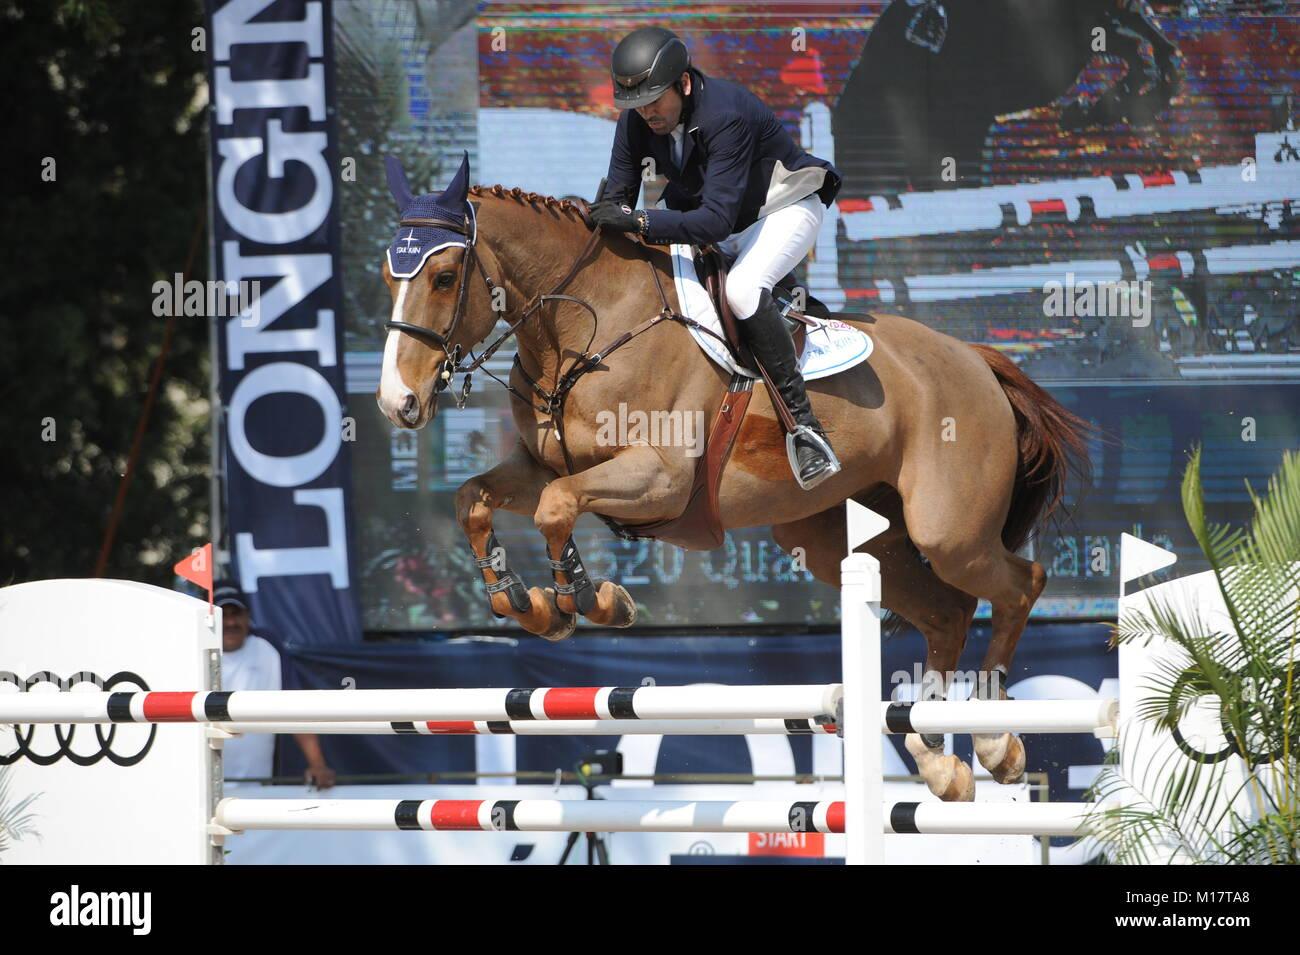 Guadalajara, Jalisco, Mexico. 27th January, 2018. CSI 4*, Longines World Cup, Mario Onate (MEX) riding Quartz de Stock Photo